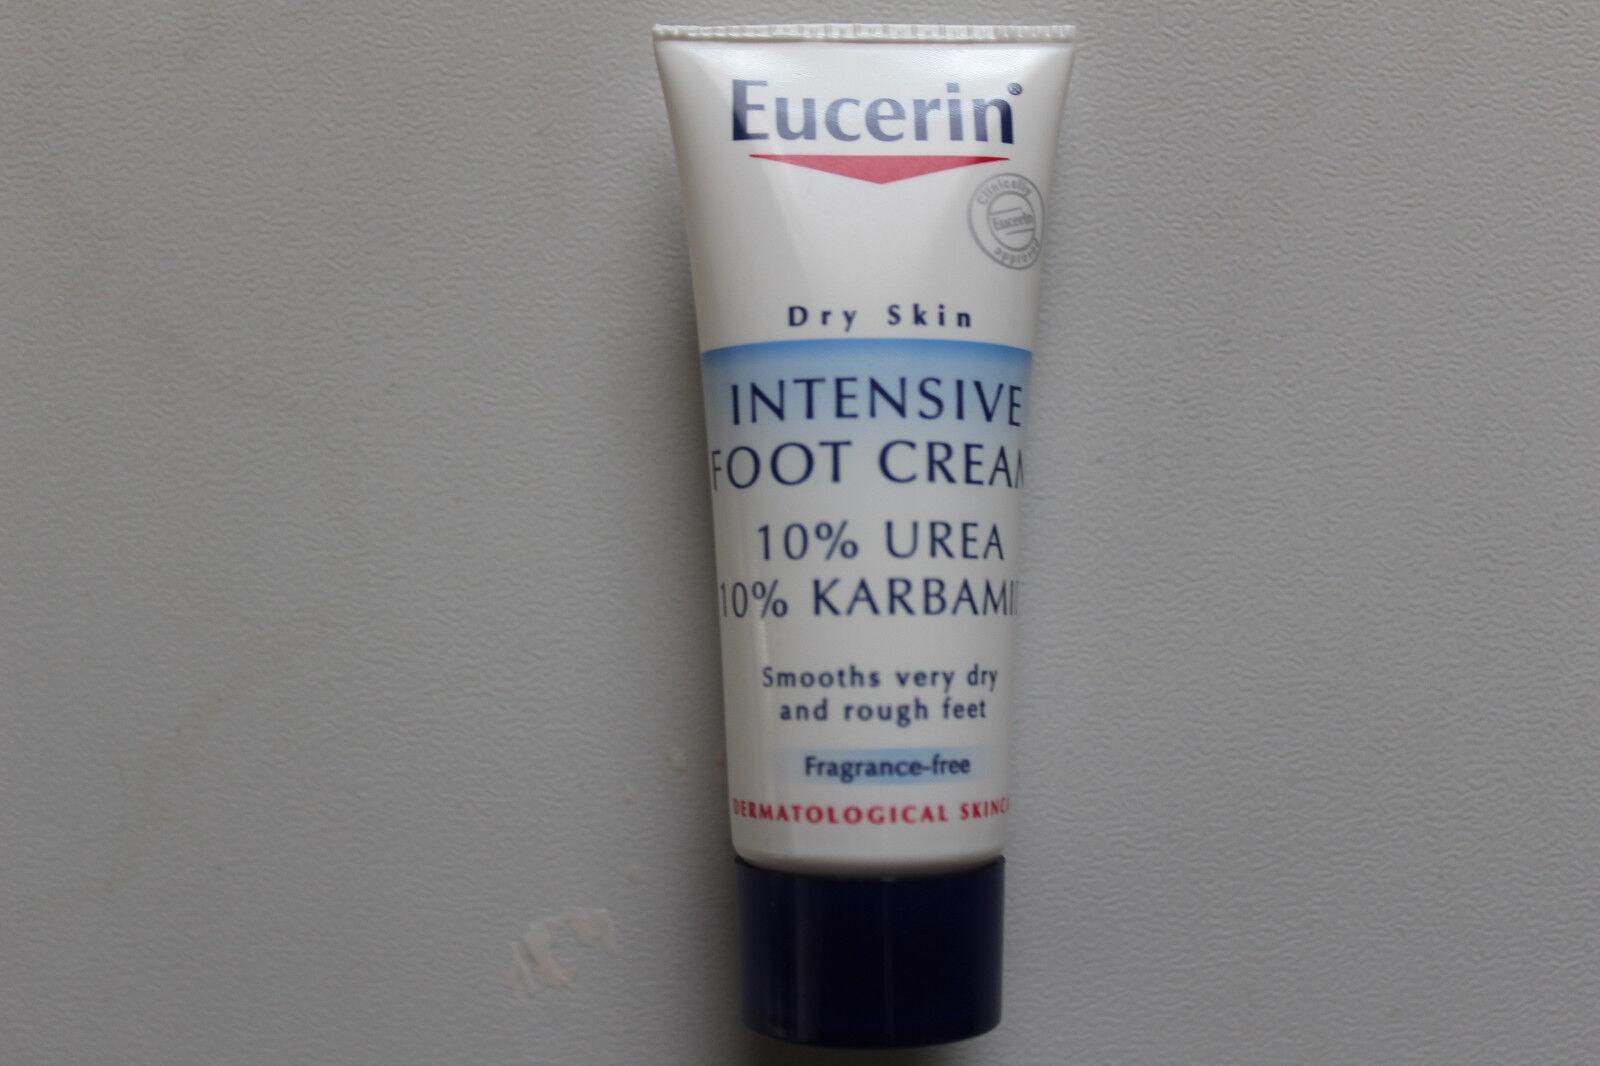 eucerin 5 karbamid face cream